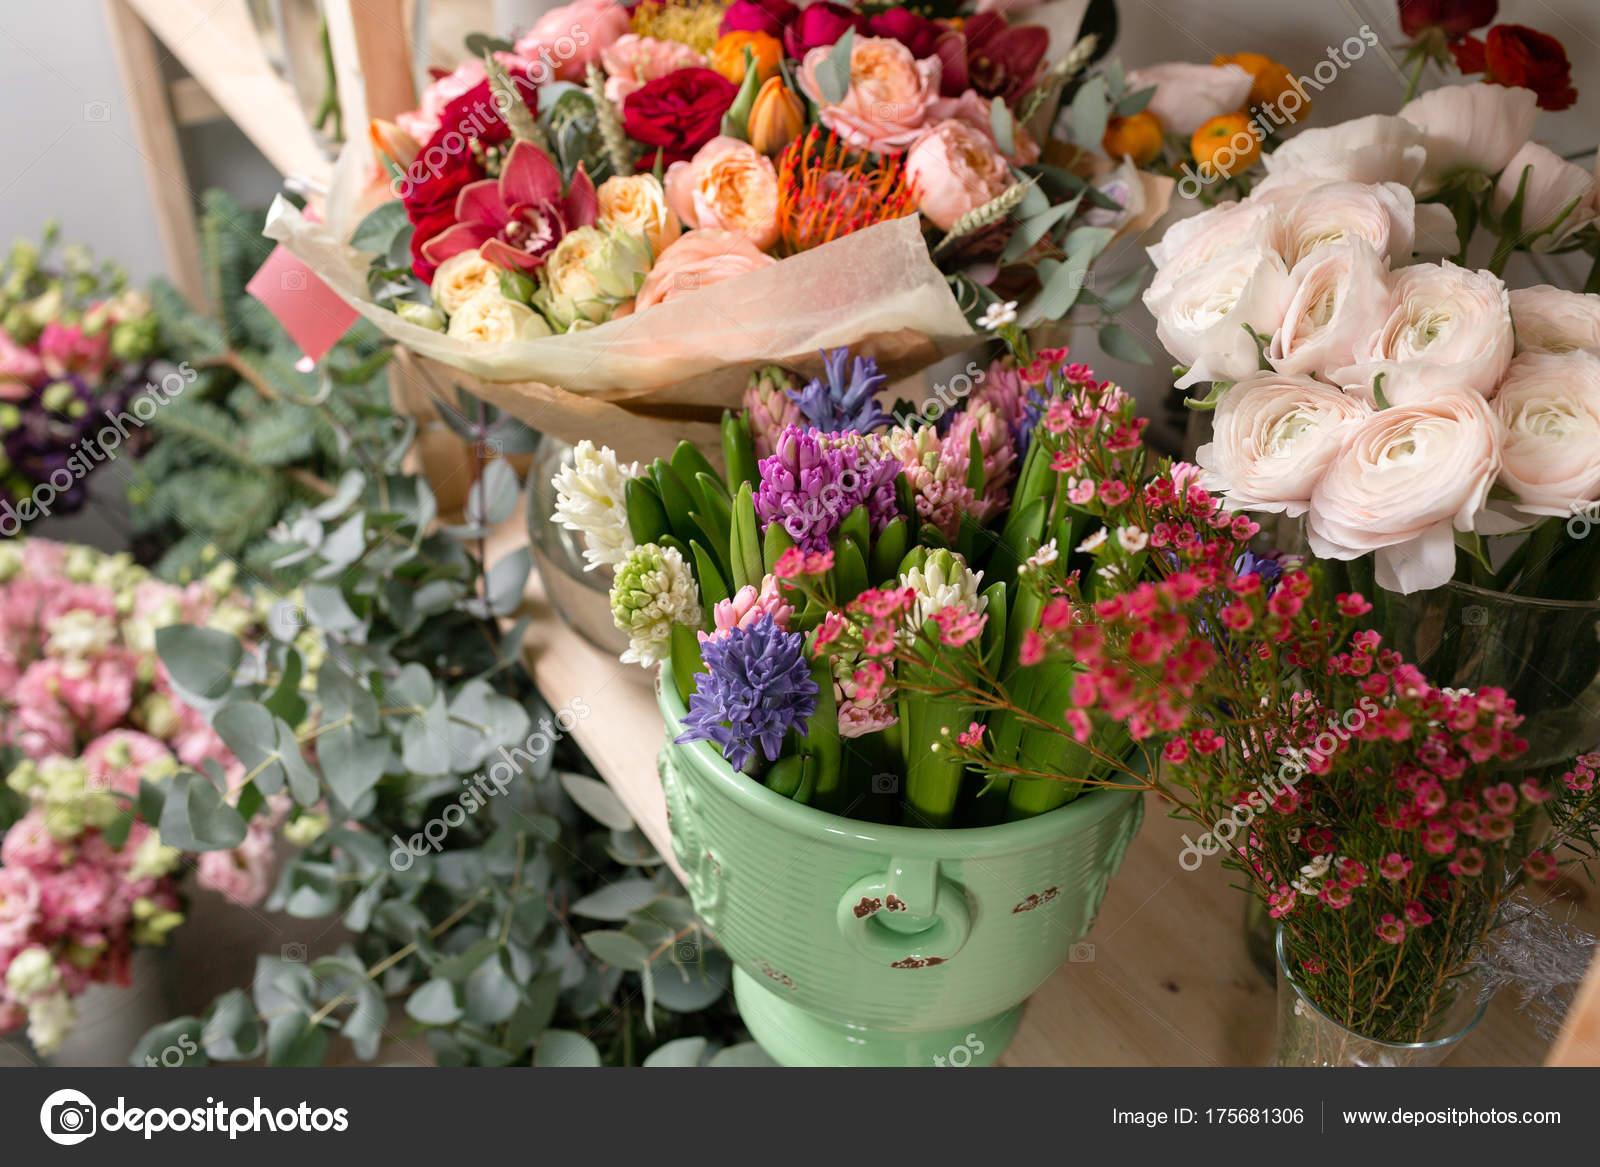 Different varieties fresh spring flowers in refrigerator for different varieties fresh spring flowers in refrigerator for flowers in flower shop bouquets on shelf florist business photo by malkovkosta mightylinksfo